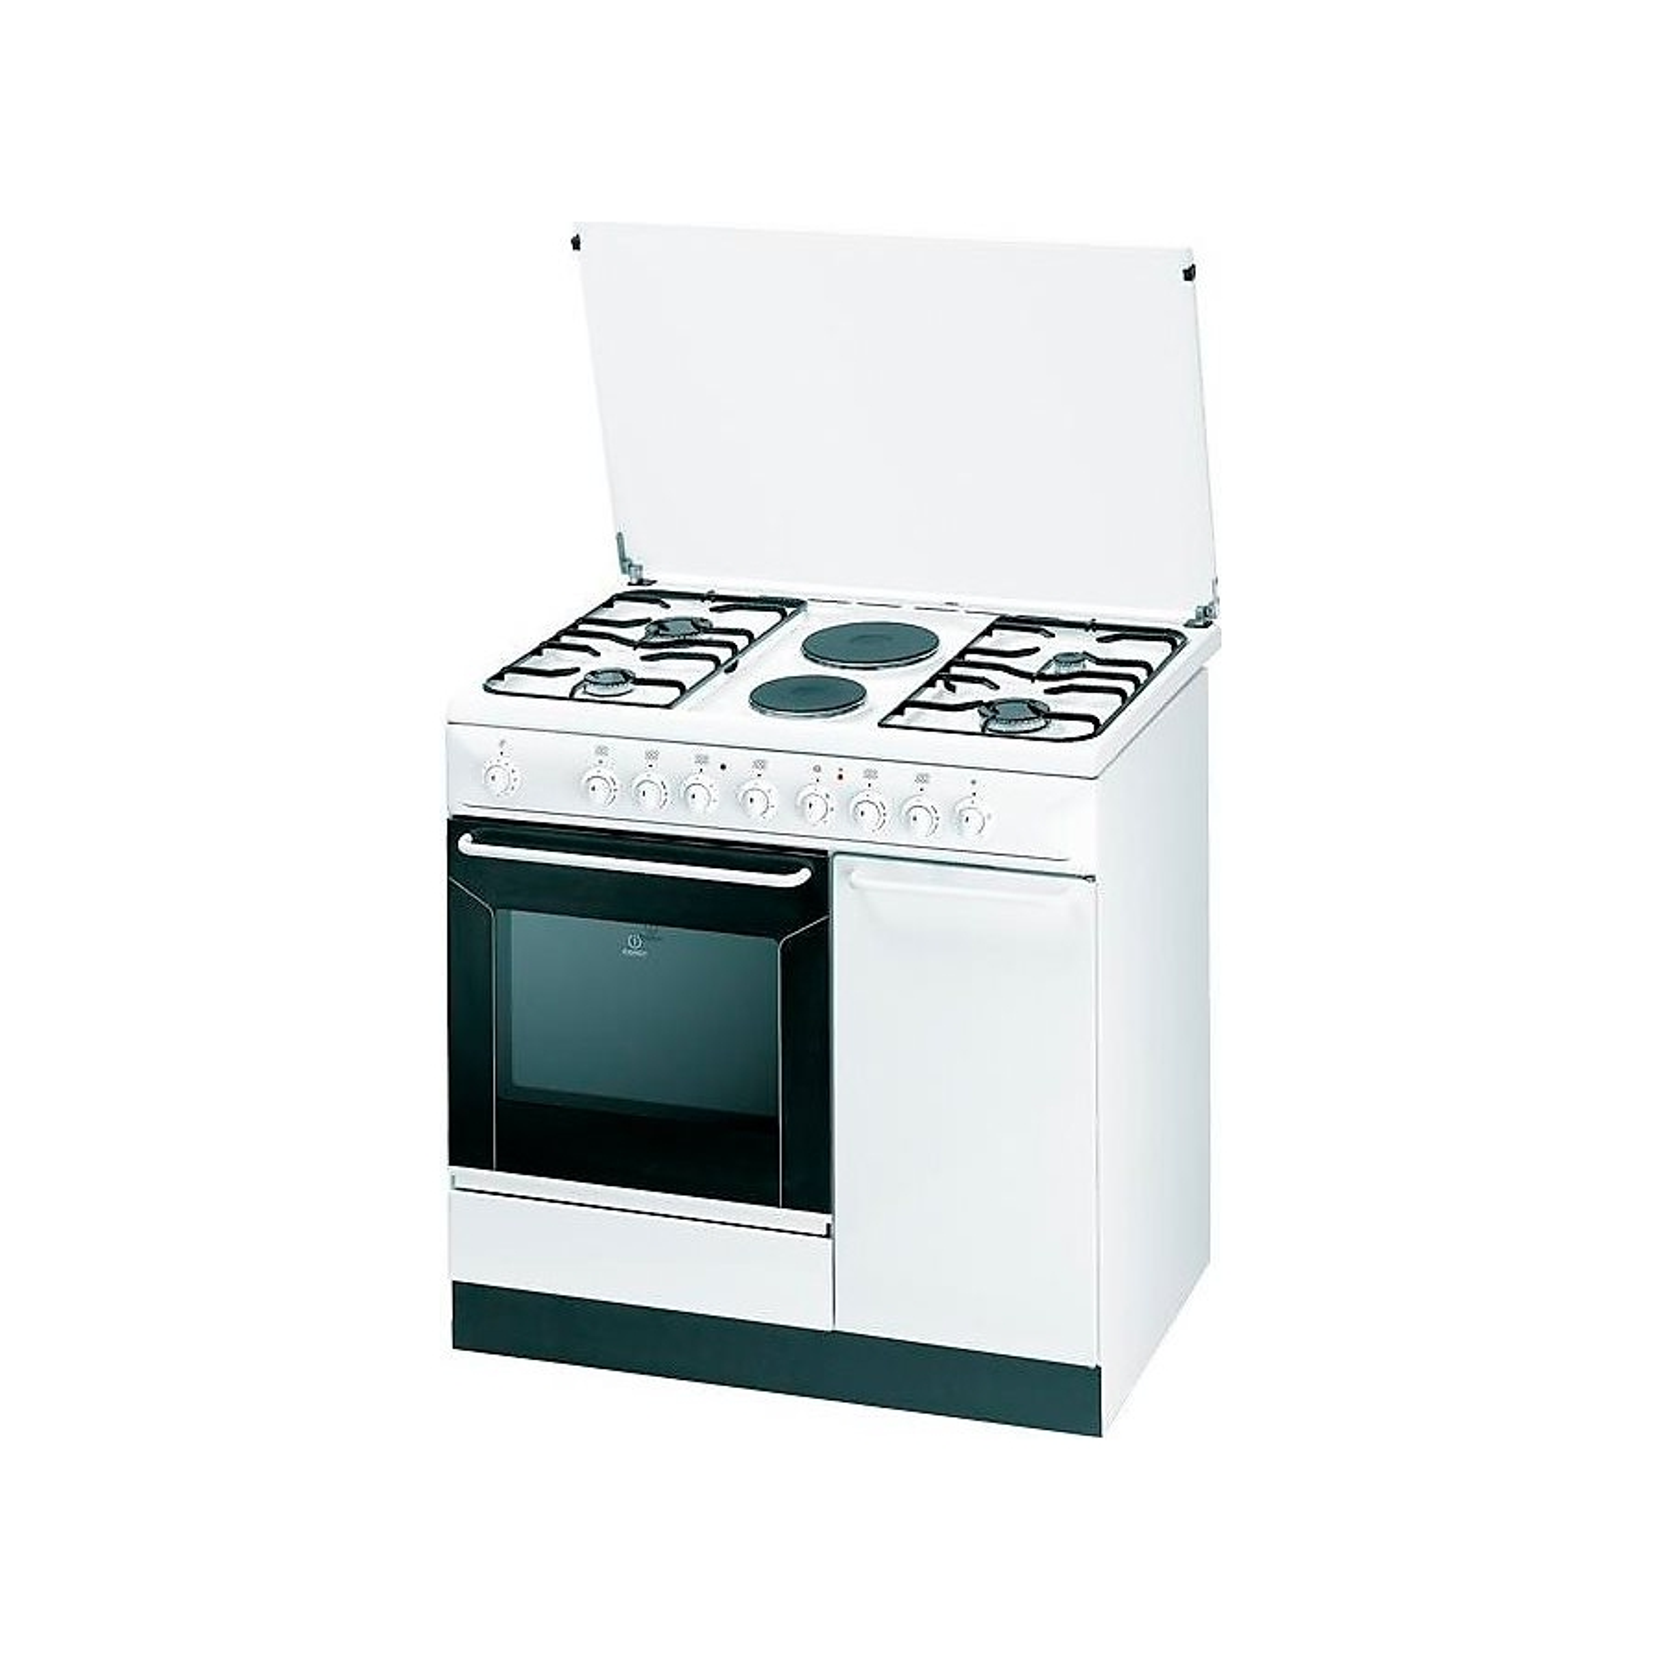 Cucina indesit k9b11sb w i con porta bombola 90x60 bianca 4 fuochi 2 piastre elettriche - Cucine a gas indesit ...